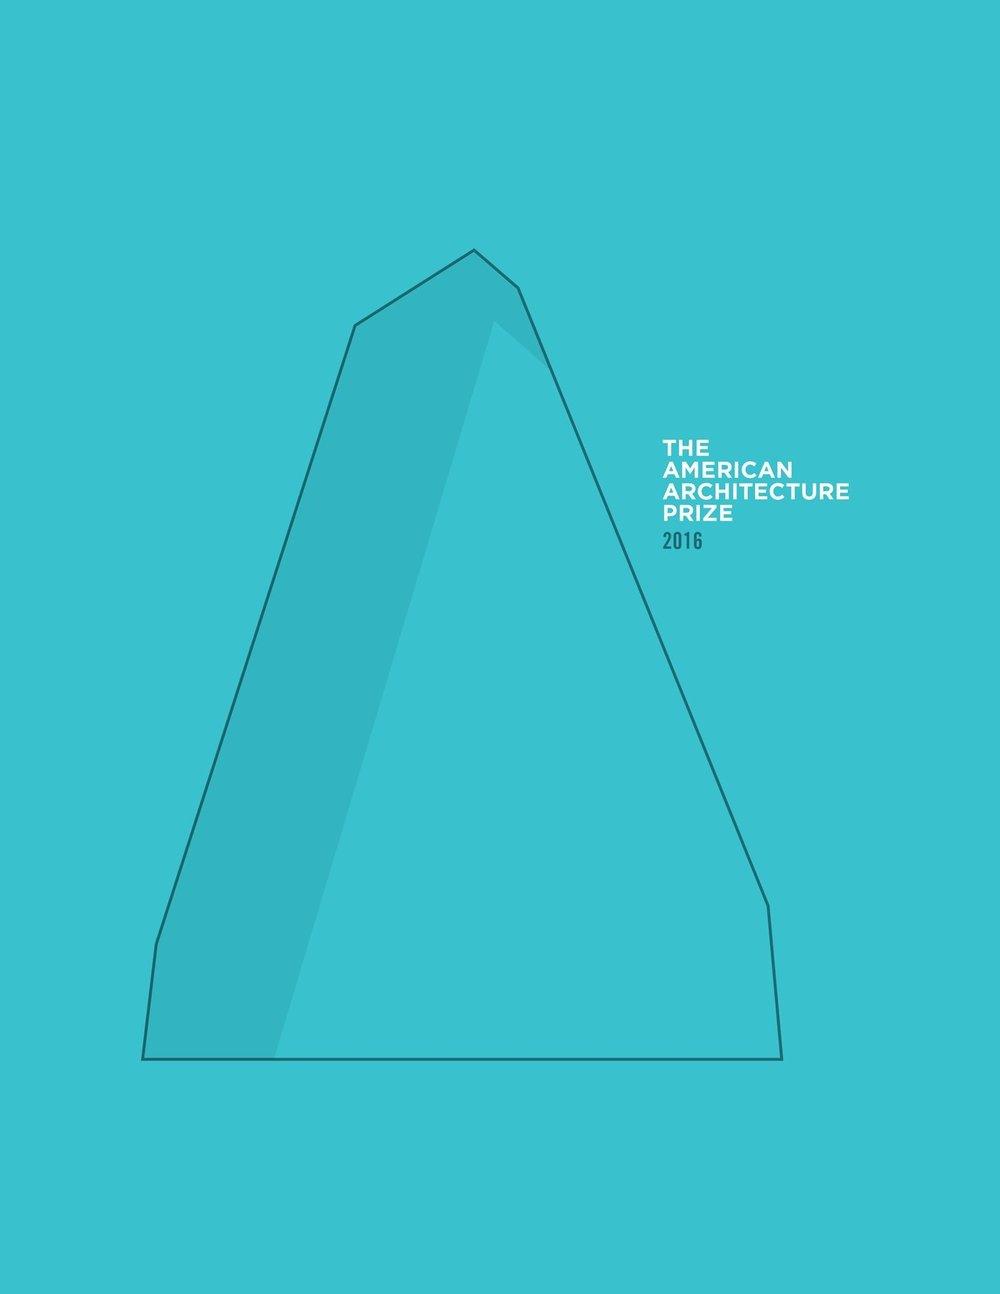 American Architecture Award 2016.jpg